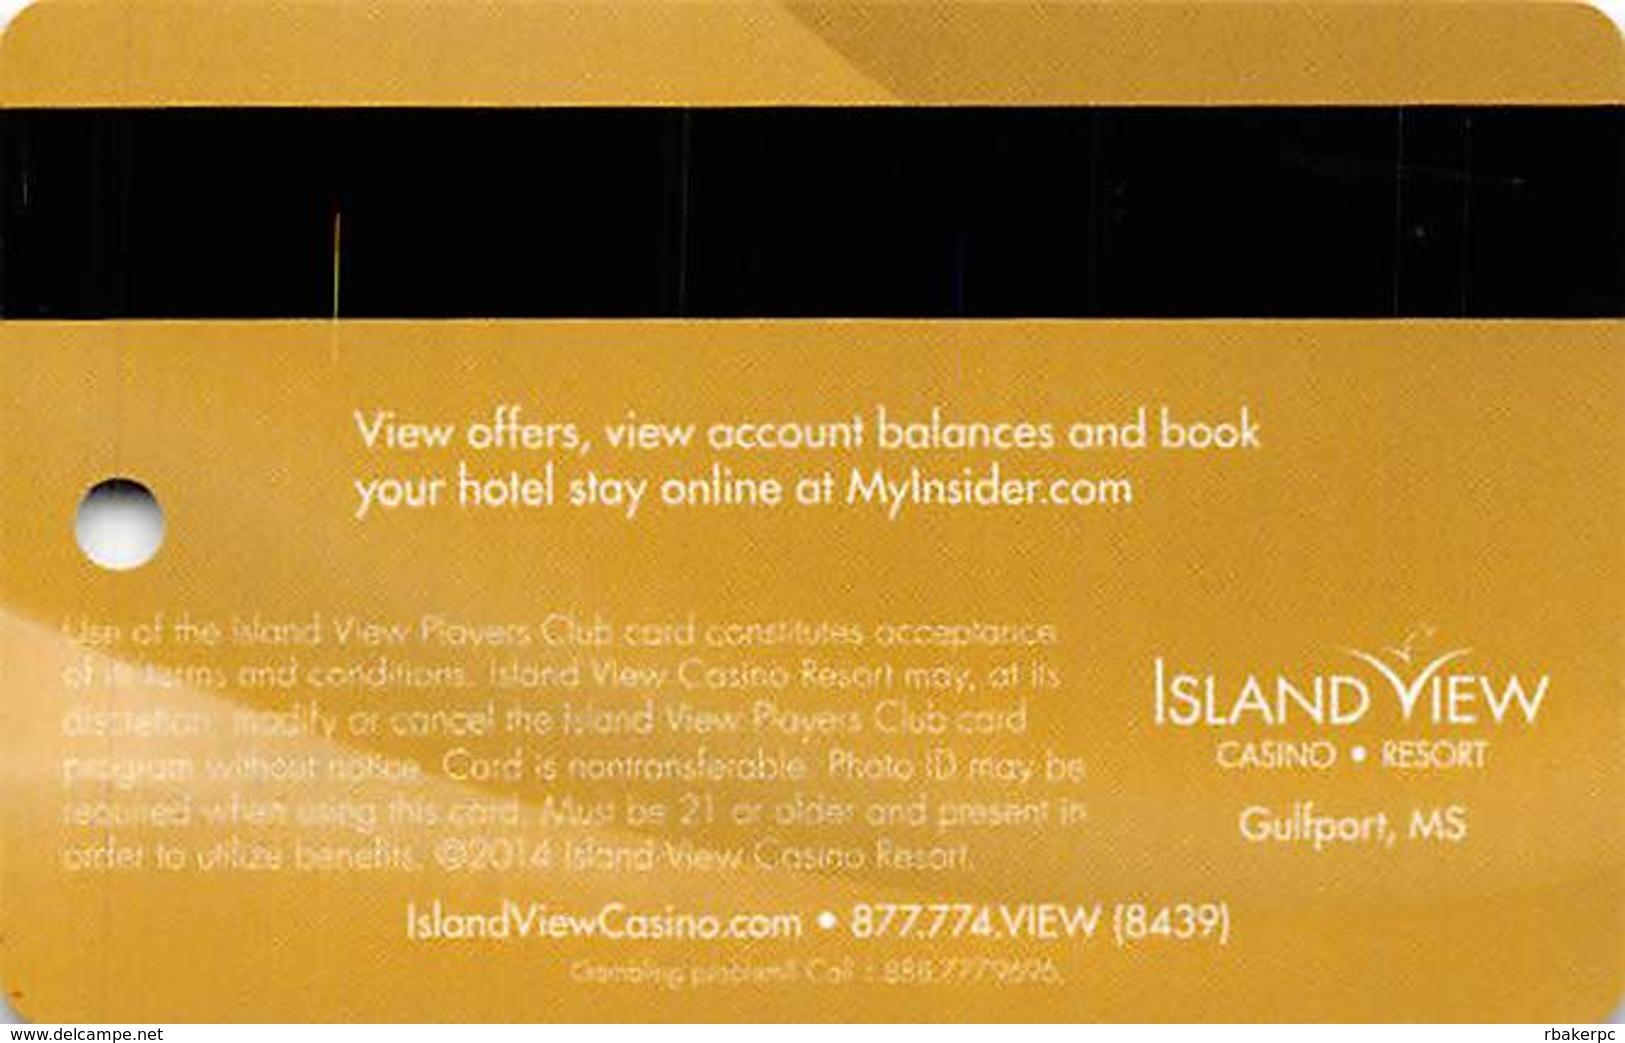 Island View Casino - Gulfport, MS USA - Insider Ultimate Slot Card - Copyright 2014 - Valid Through Dec 2014 - Casino Cards